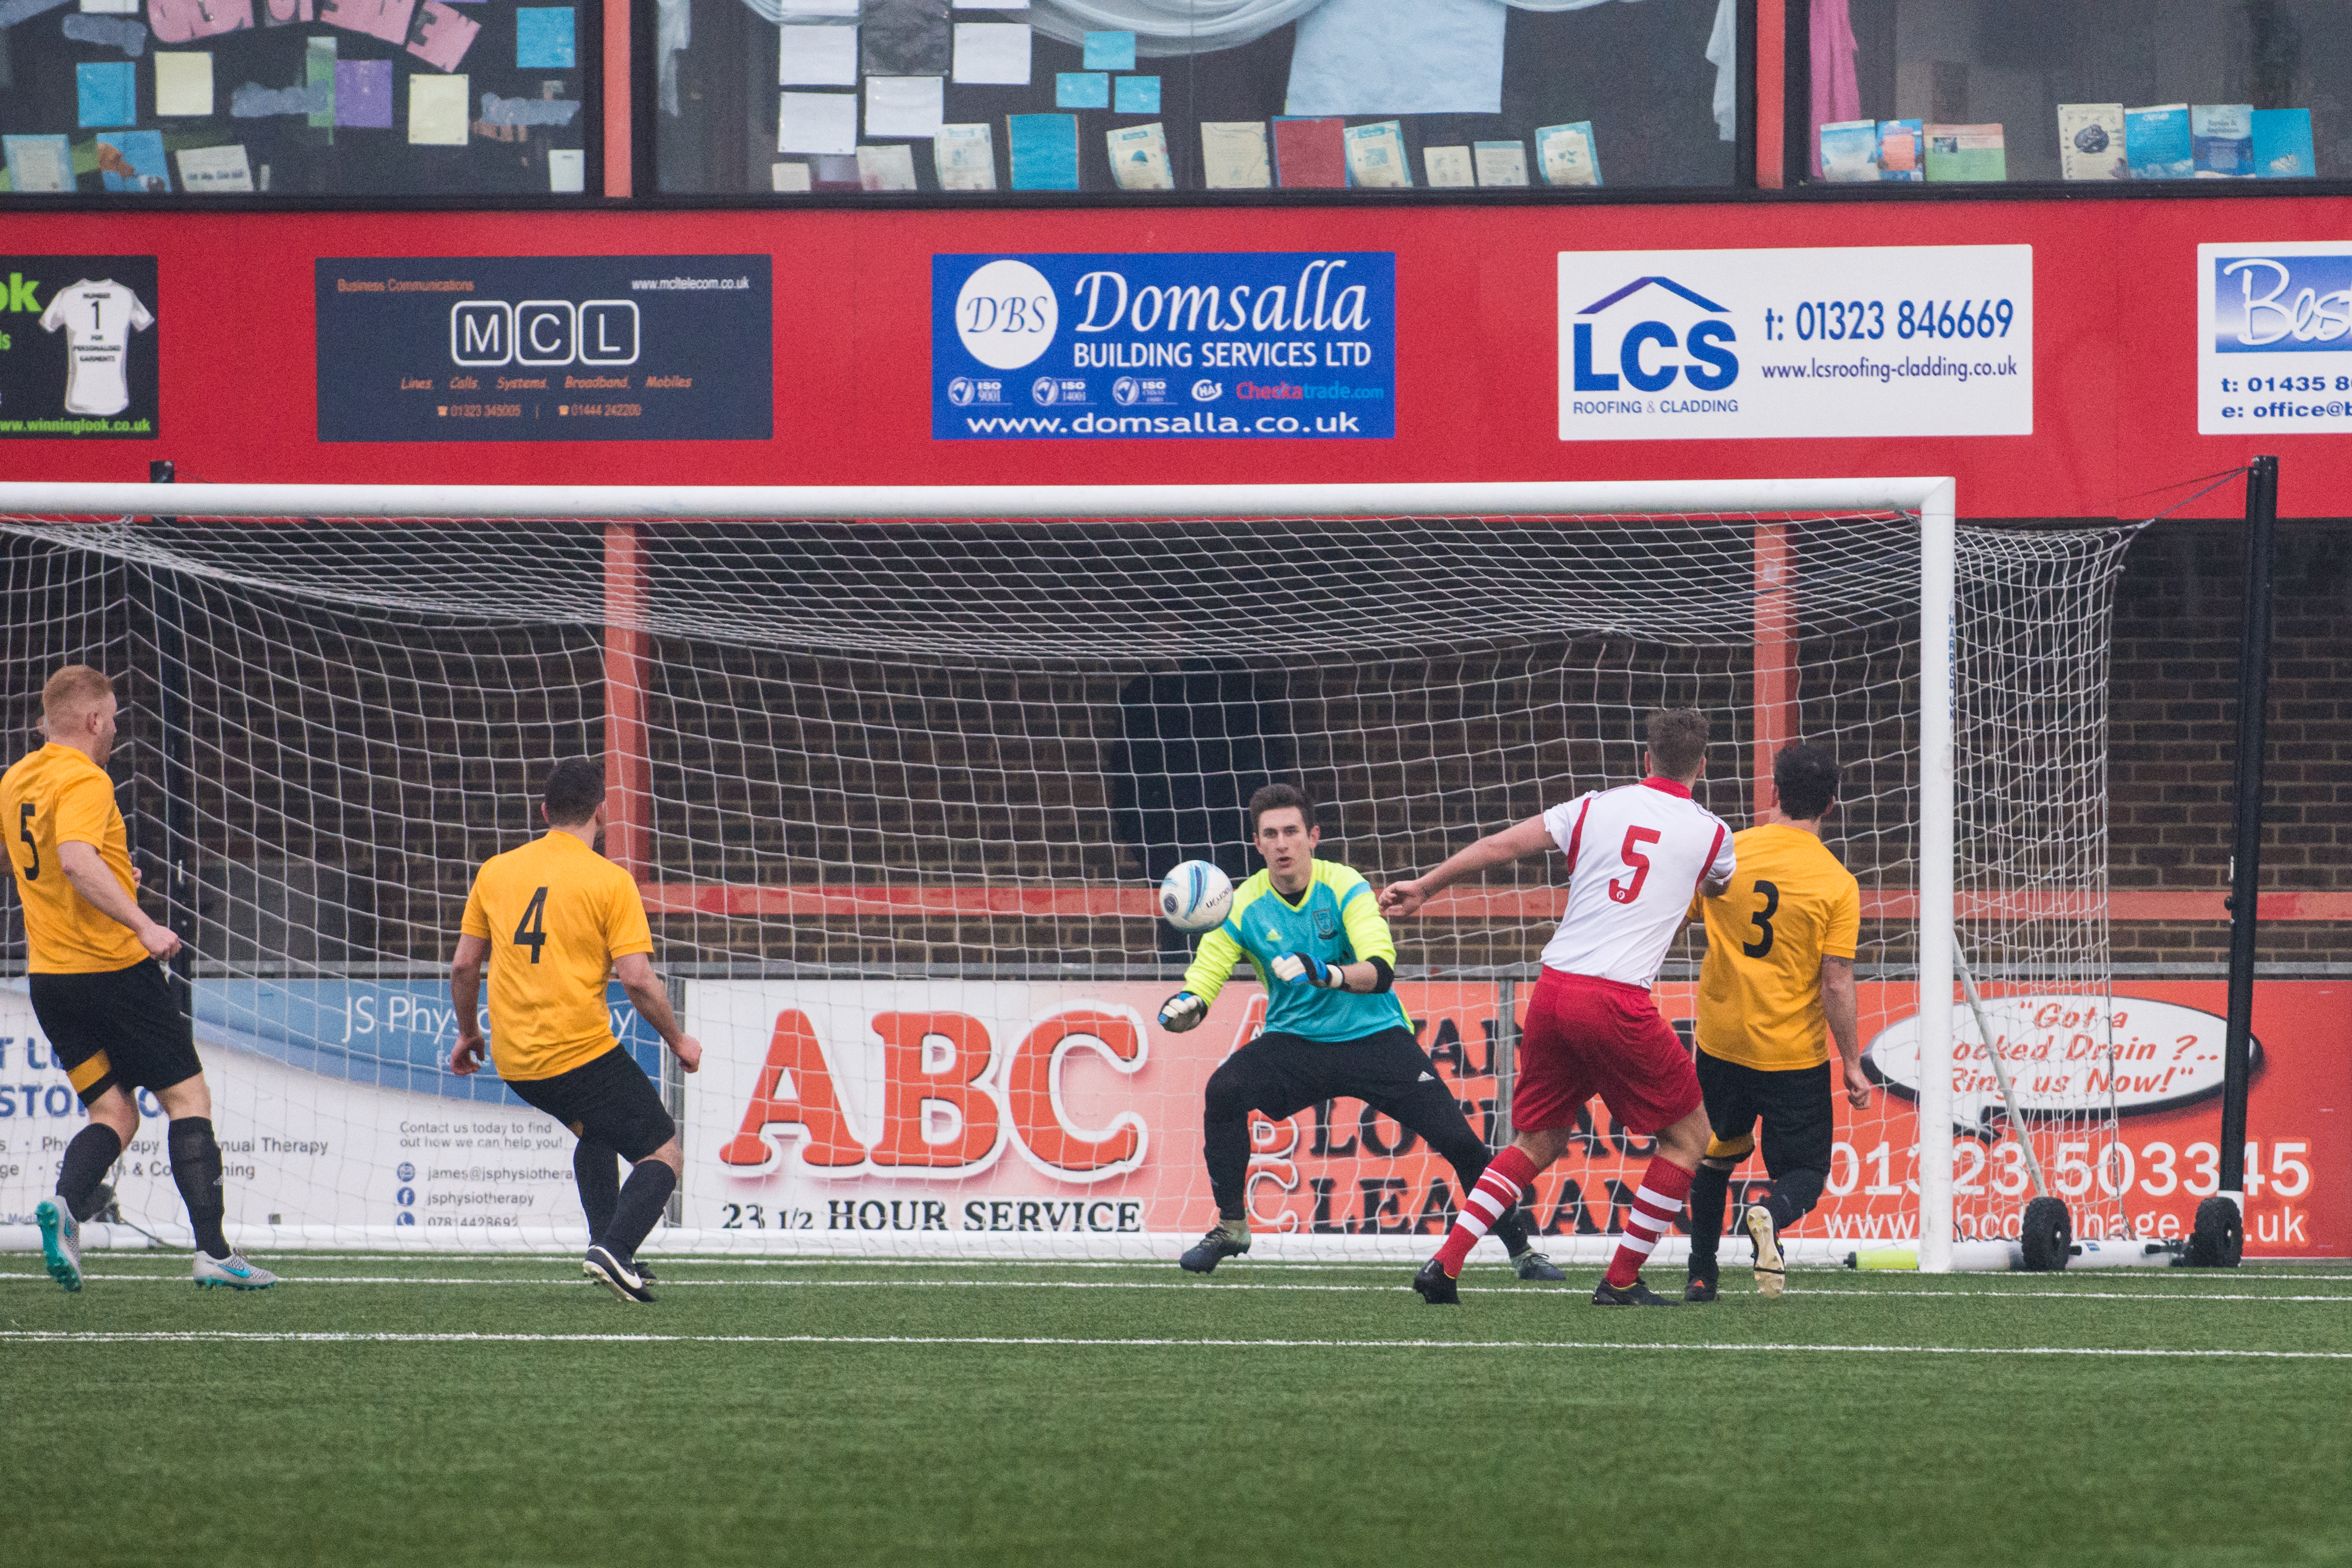 DAVID_JEFFERY Langney Wanderers FC vs Bexhill United FC 03.03.18 75